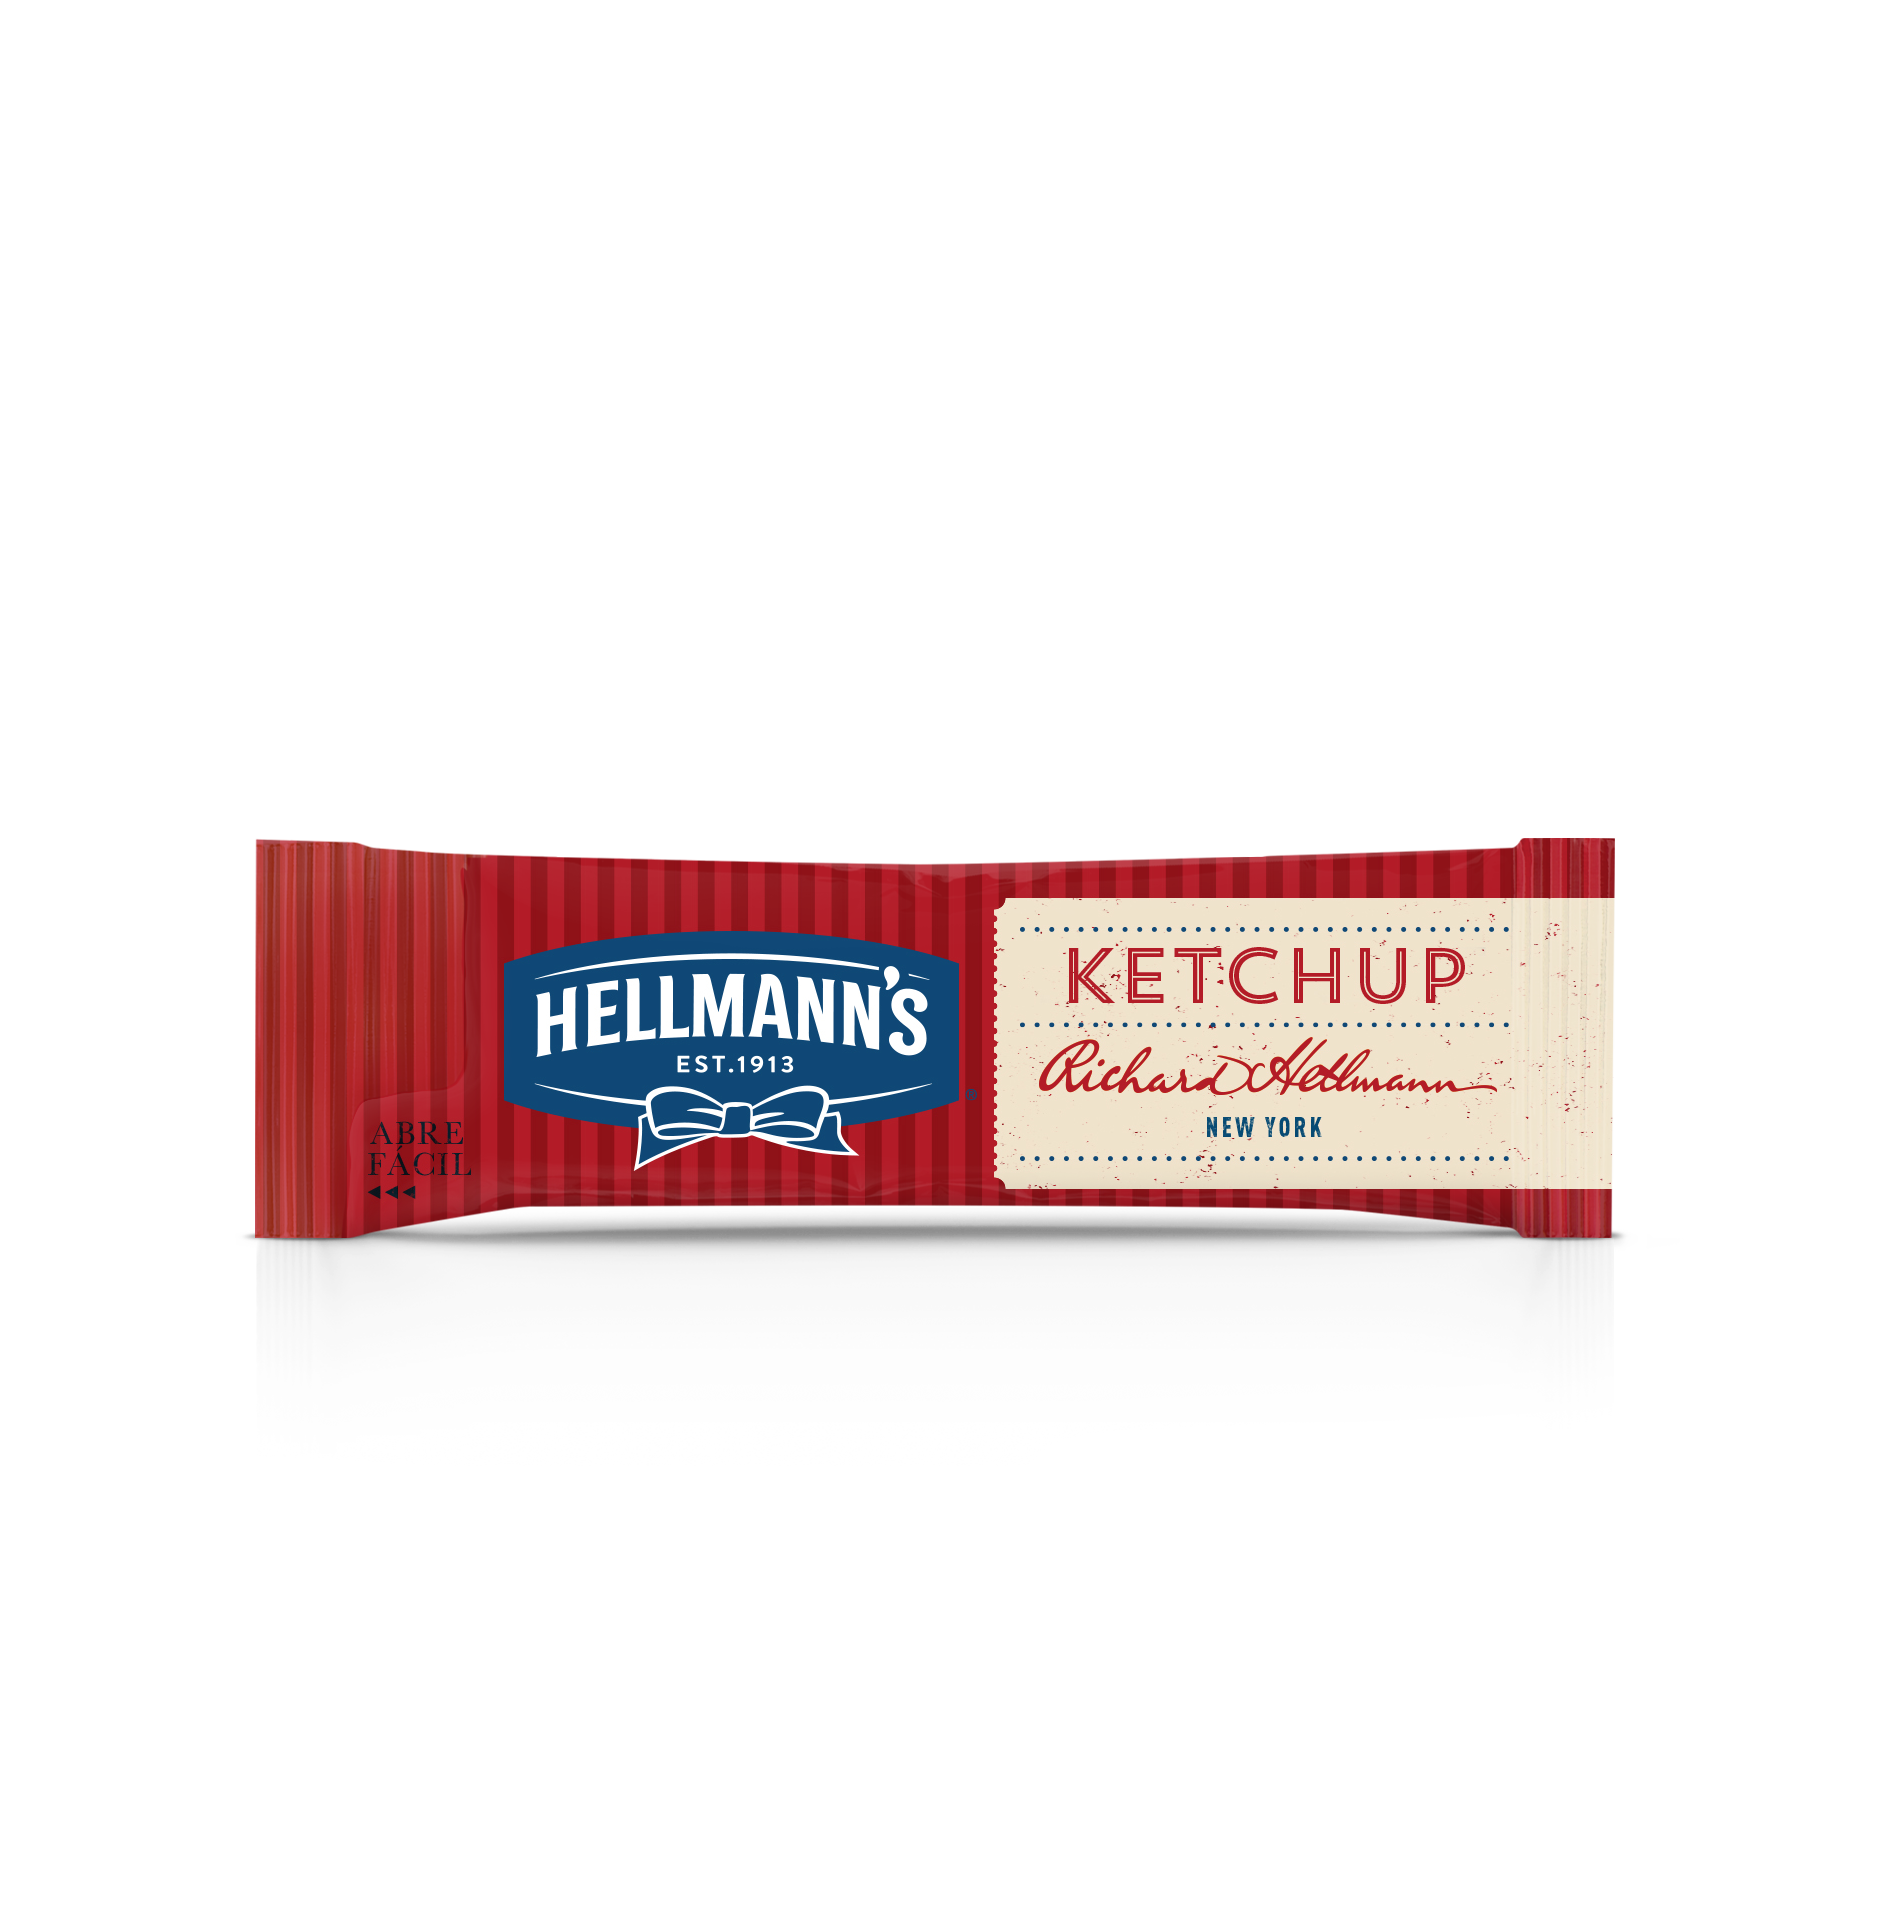 Ketchup Hellmann's - Sachê 'Abre Fácil' 10g - Novo sachê abre fácil: sem desperdício, sem sujeira.